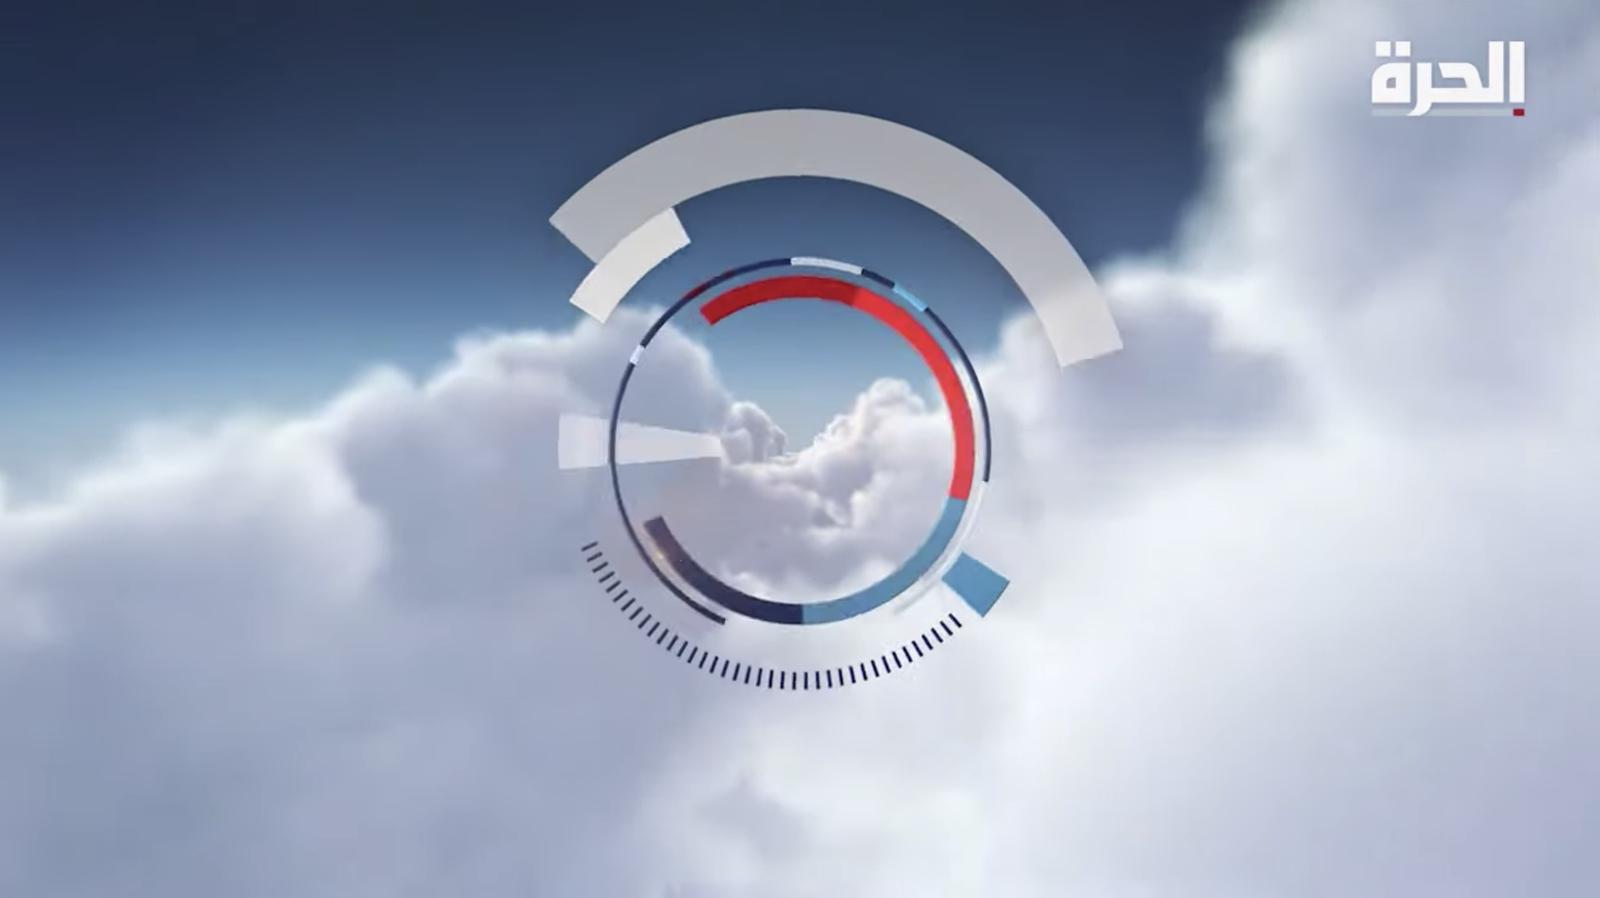 NCS_Alhurra_broadcast-design_0021